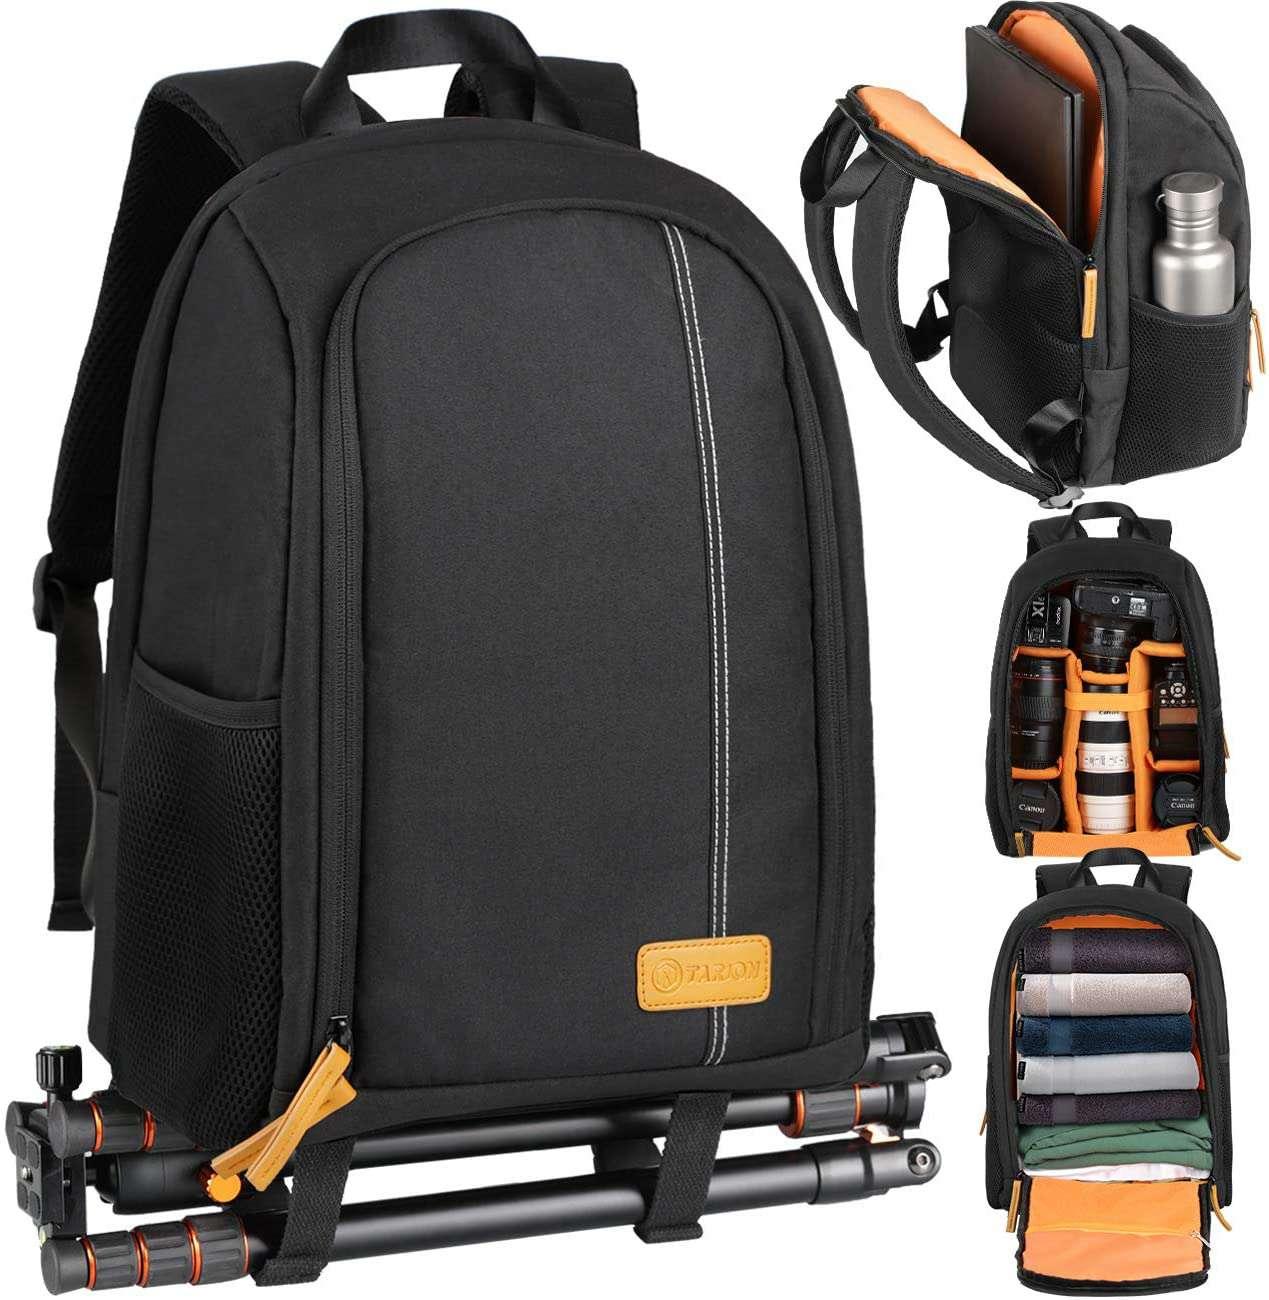 Tarion Camera Backpack